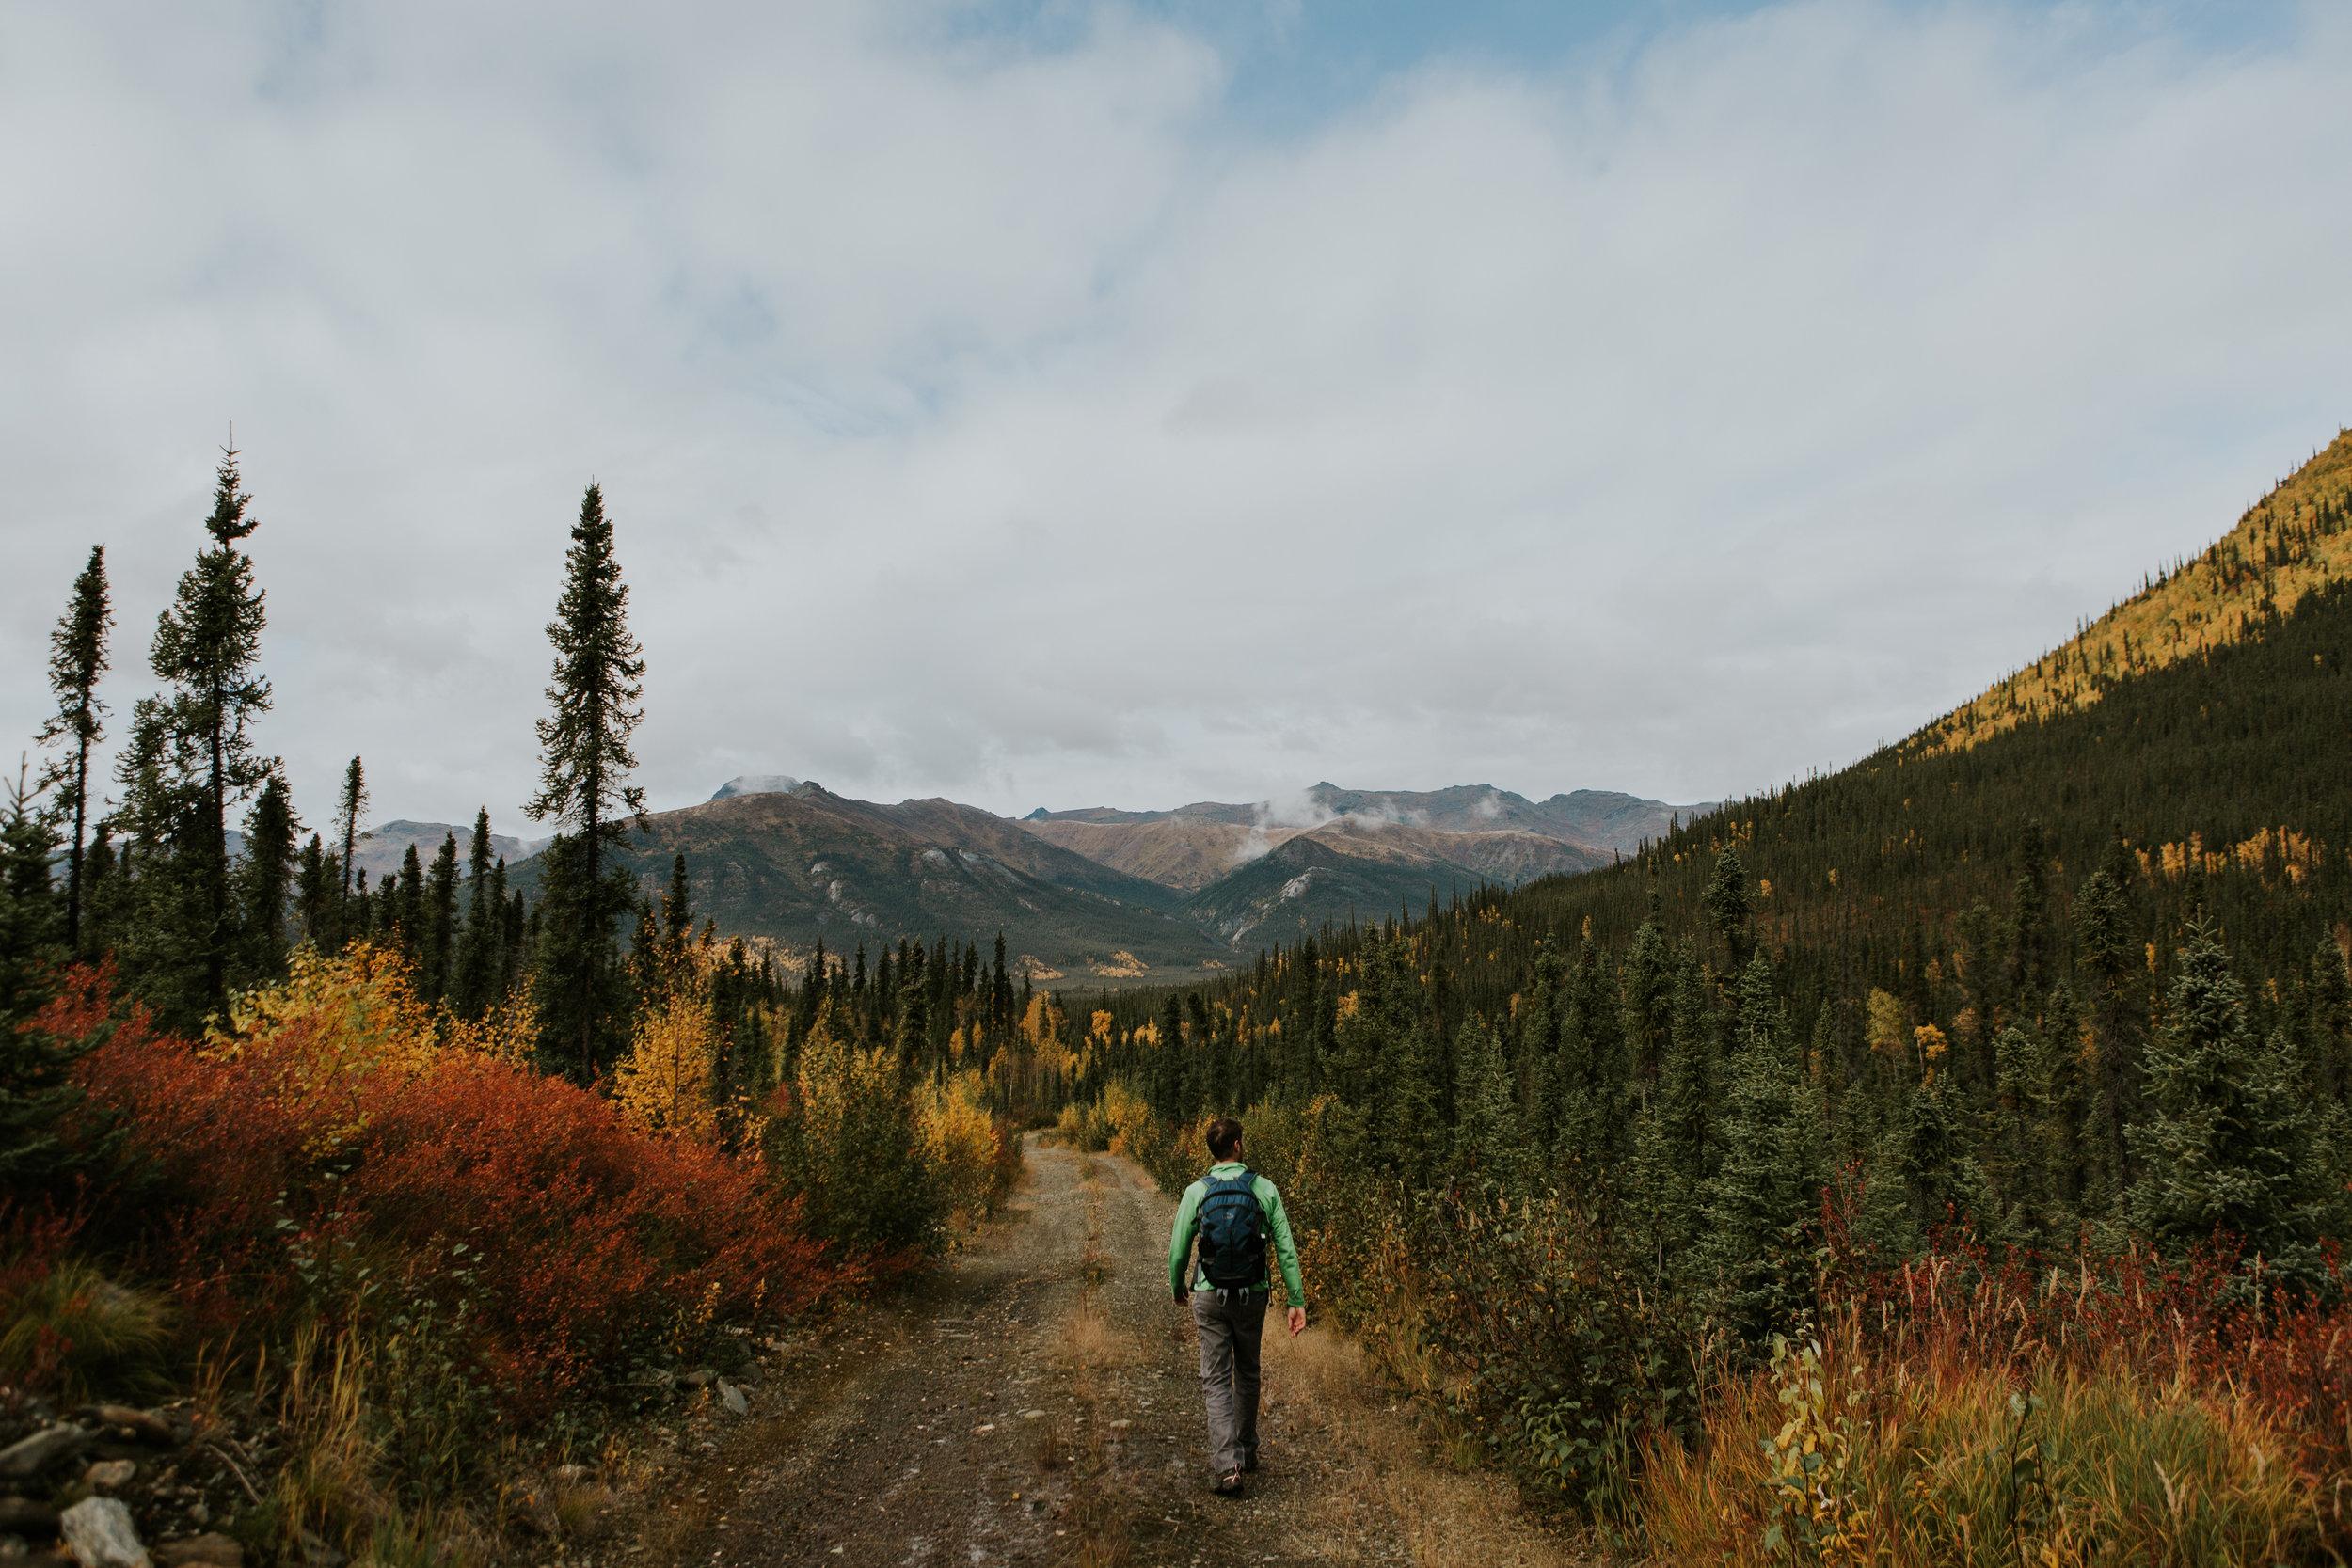 CindyGiovagnoli_Alaska_KoyukukRiver_SukakpakMountain_JimRiver_ArcticCircle_fly_fishing_September-044.jpg